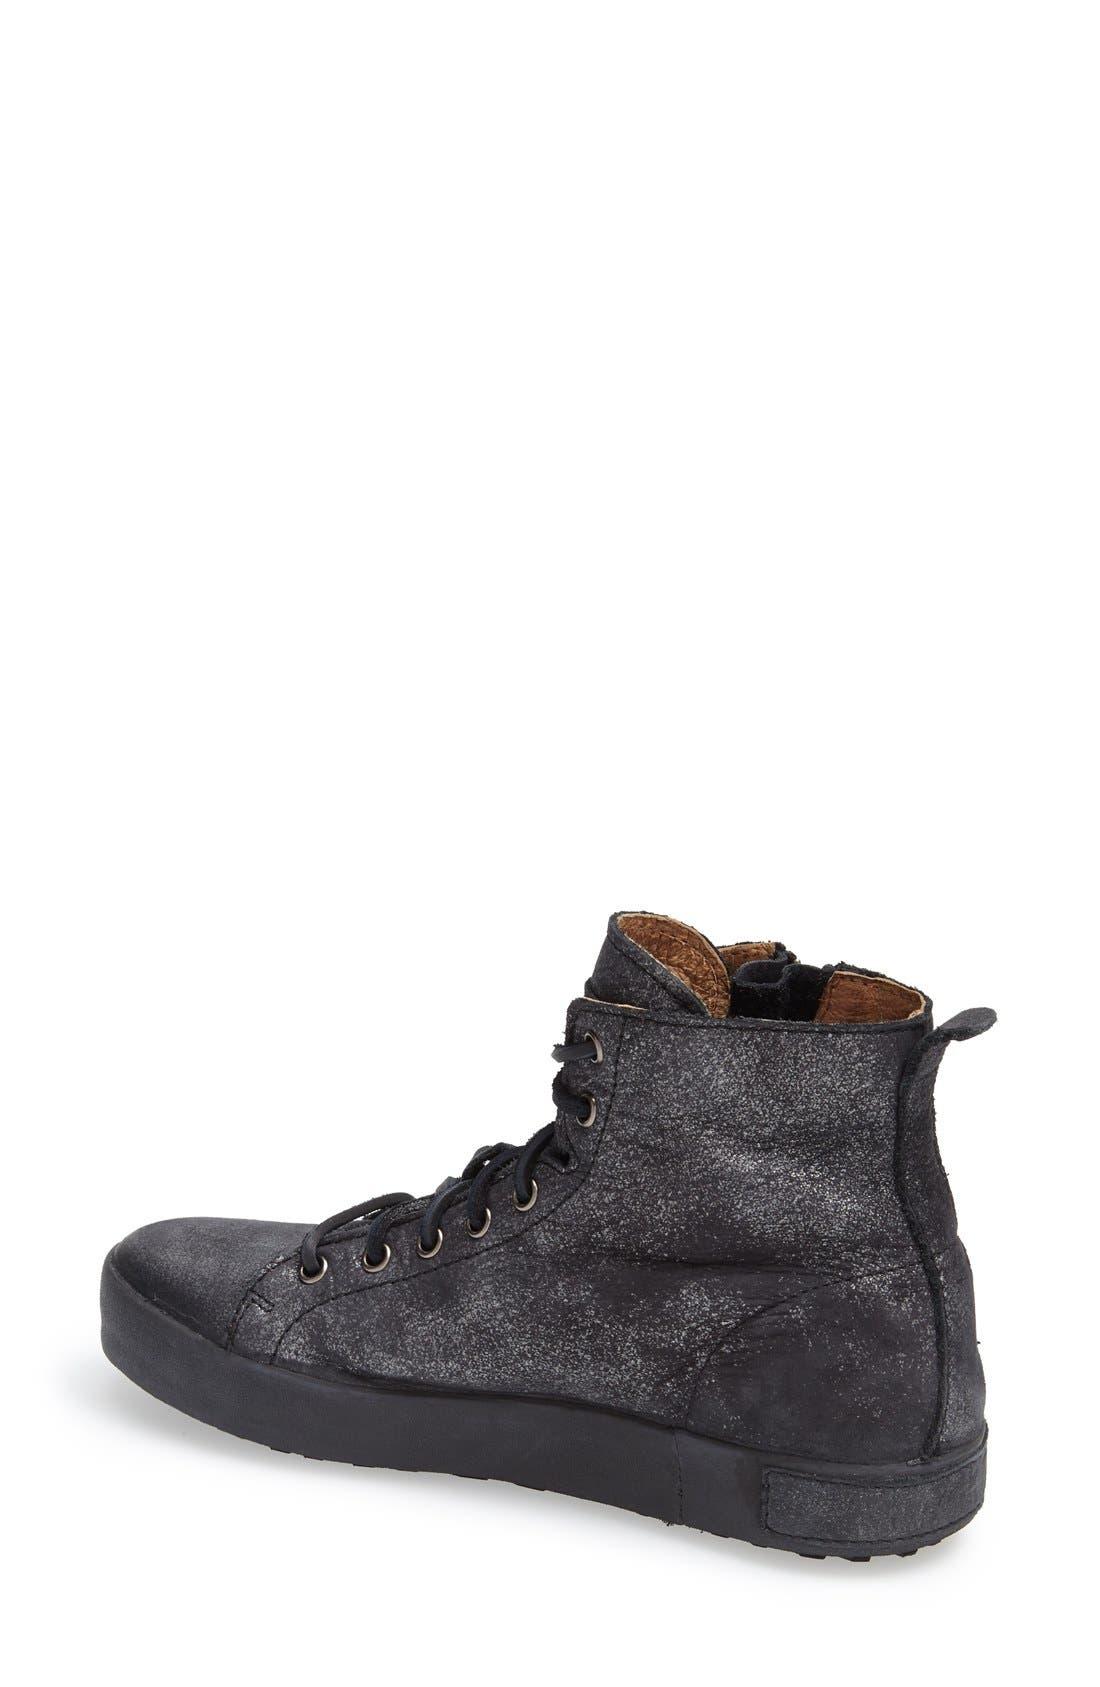 'JL' High Top Sneaker,                             Alternate thumbnail 2, color,                             Black Metallic